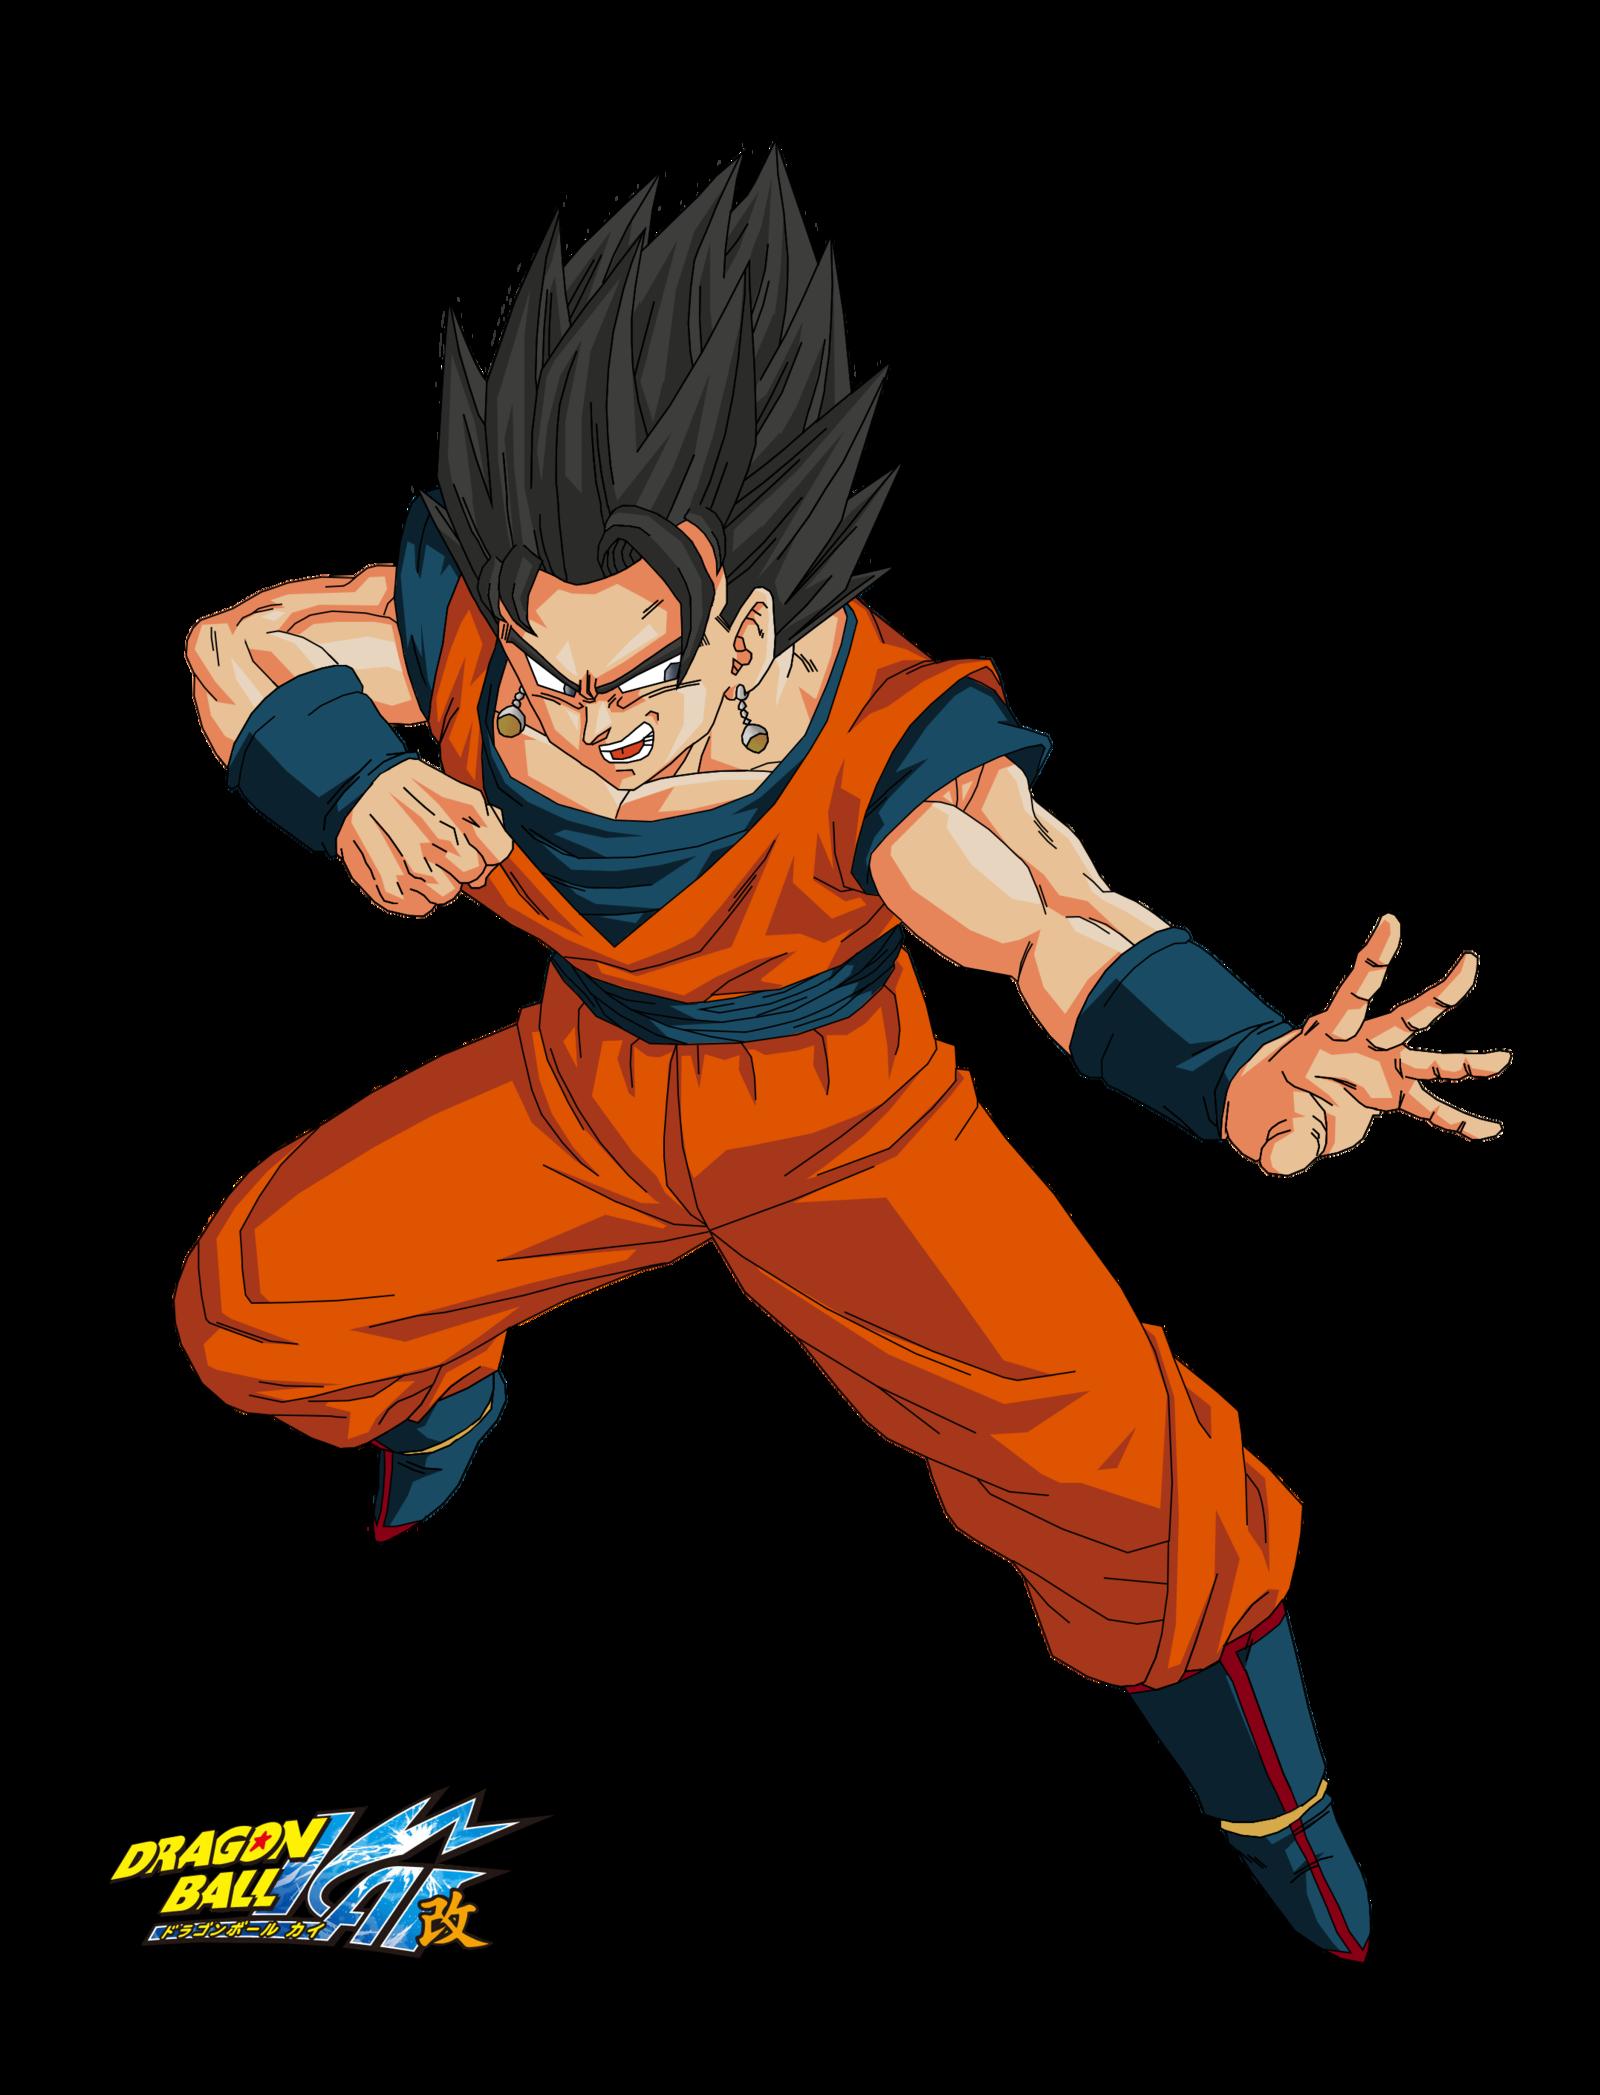 Gokhan No Background By Naruttebayo67 Dragon Ball Super Art Dragon Ball Super Manga Dragon Ball Art